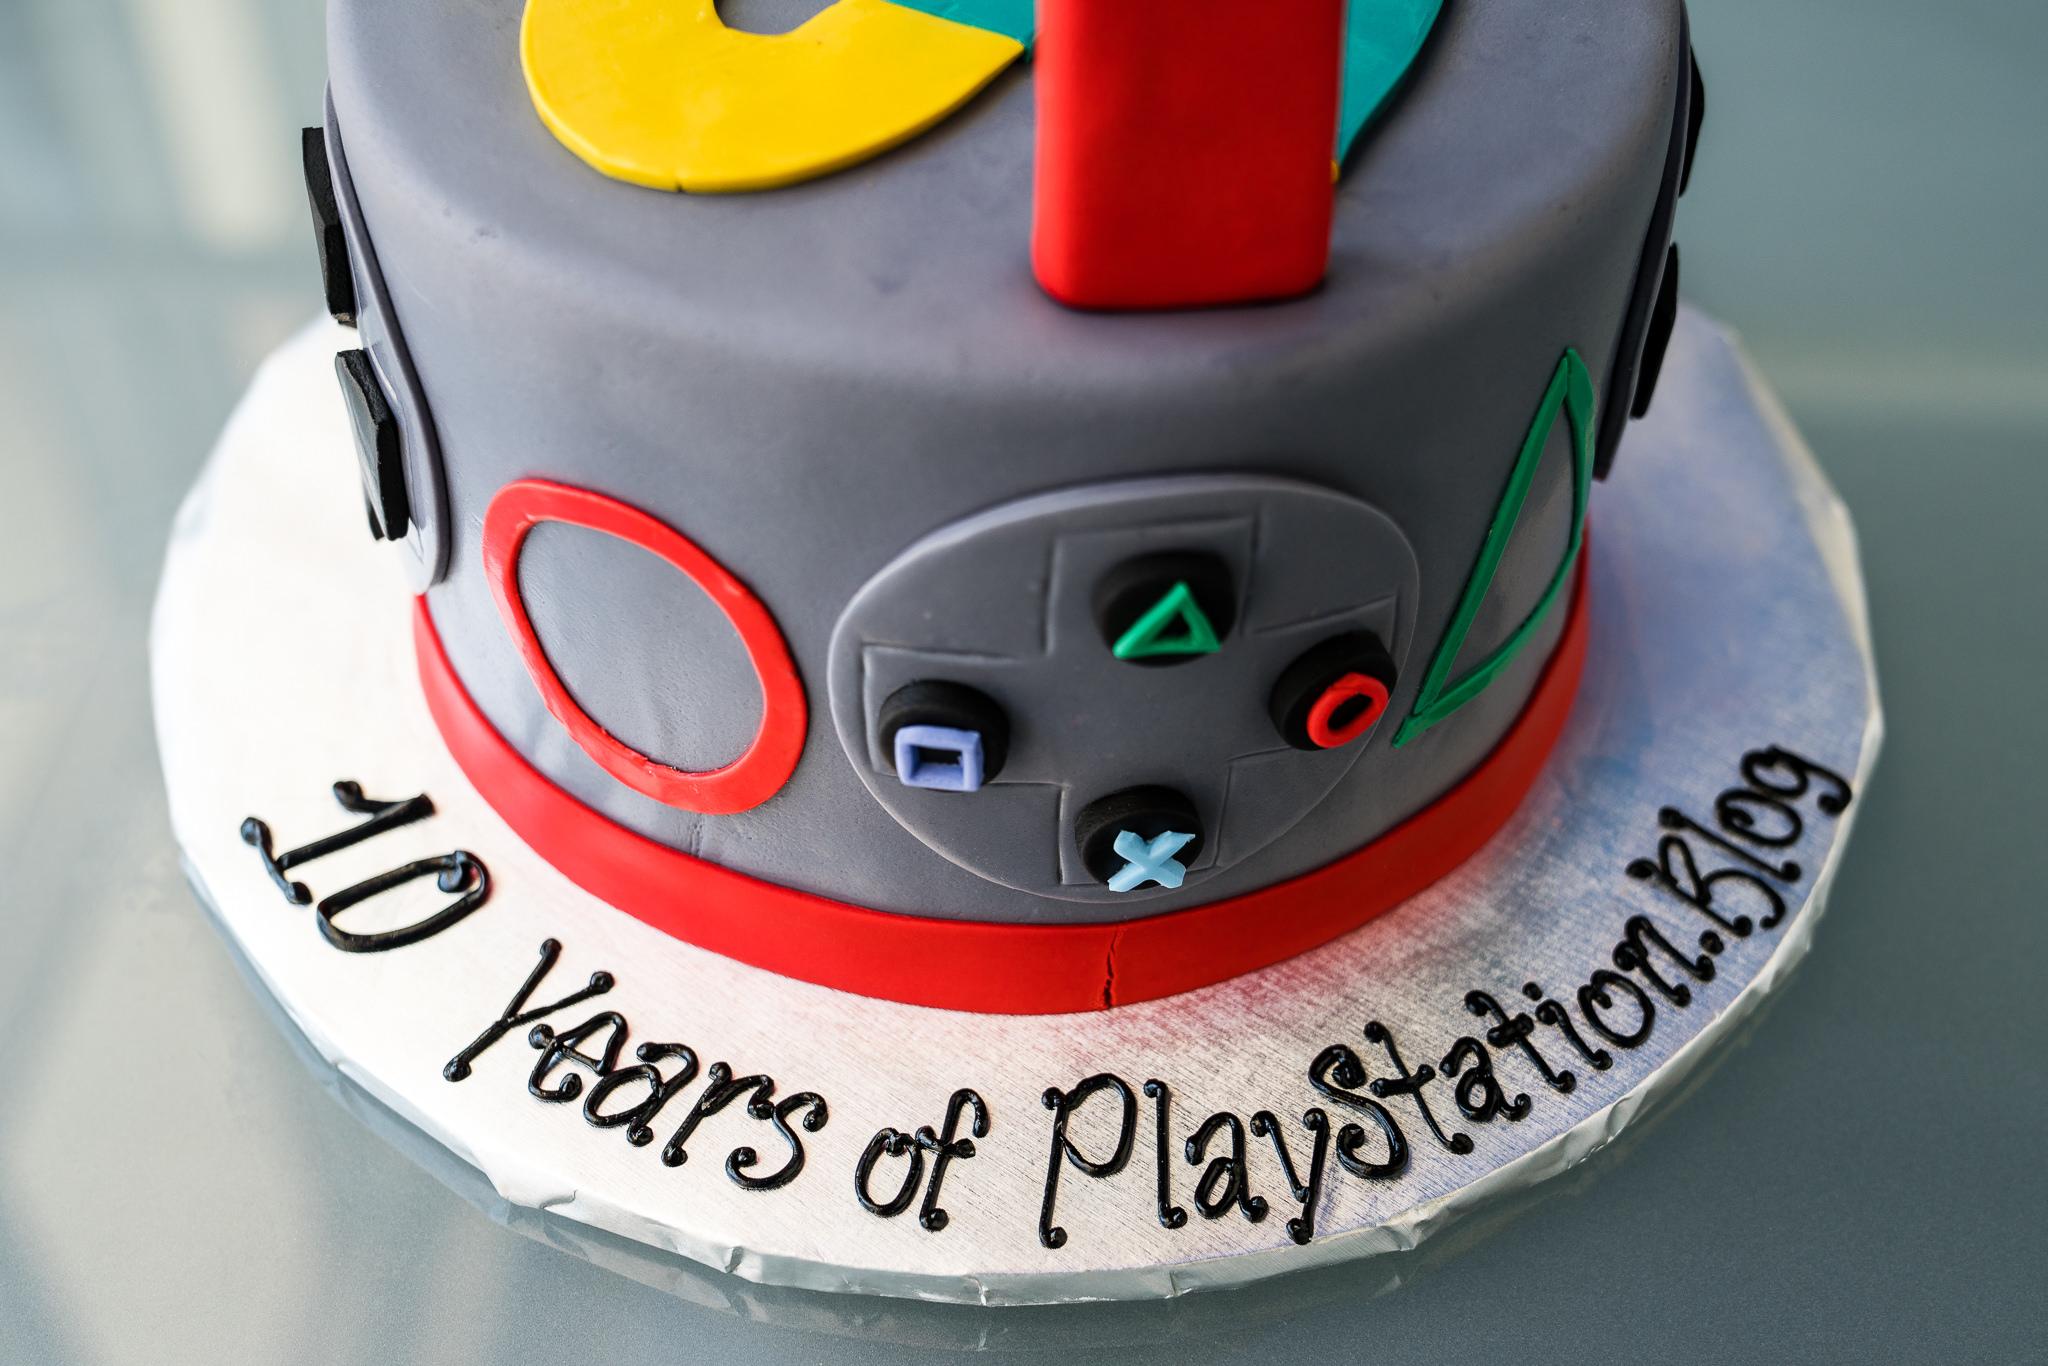 Sony PlayStation Cake